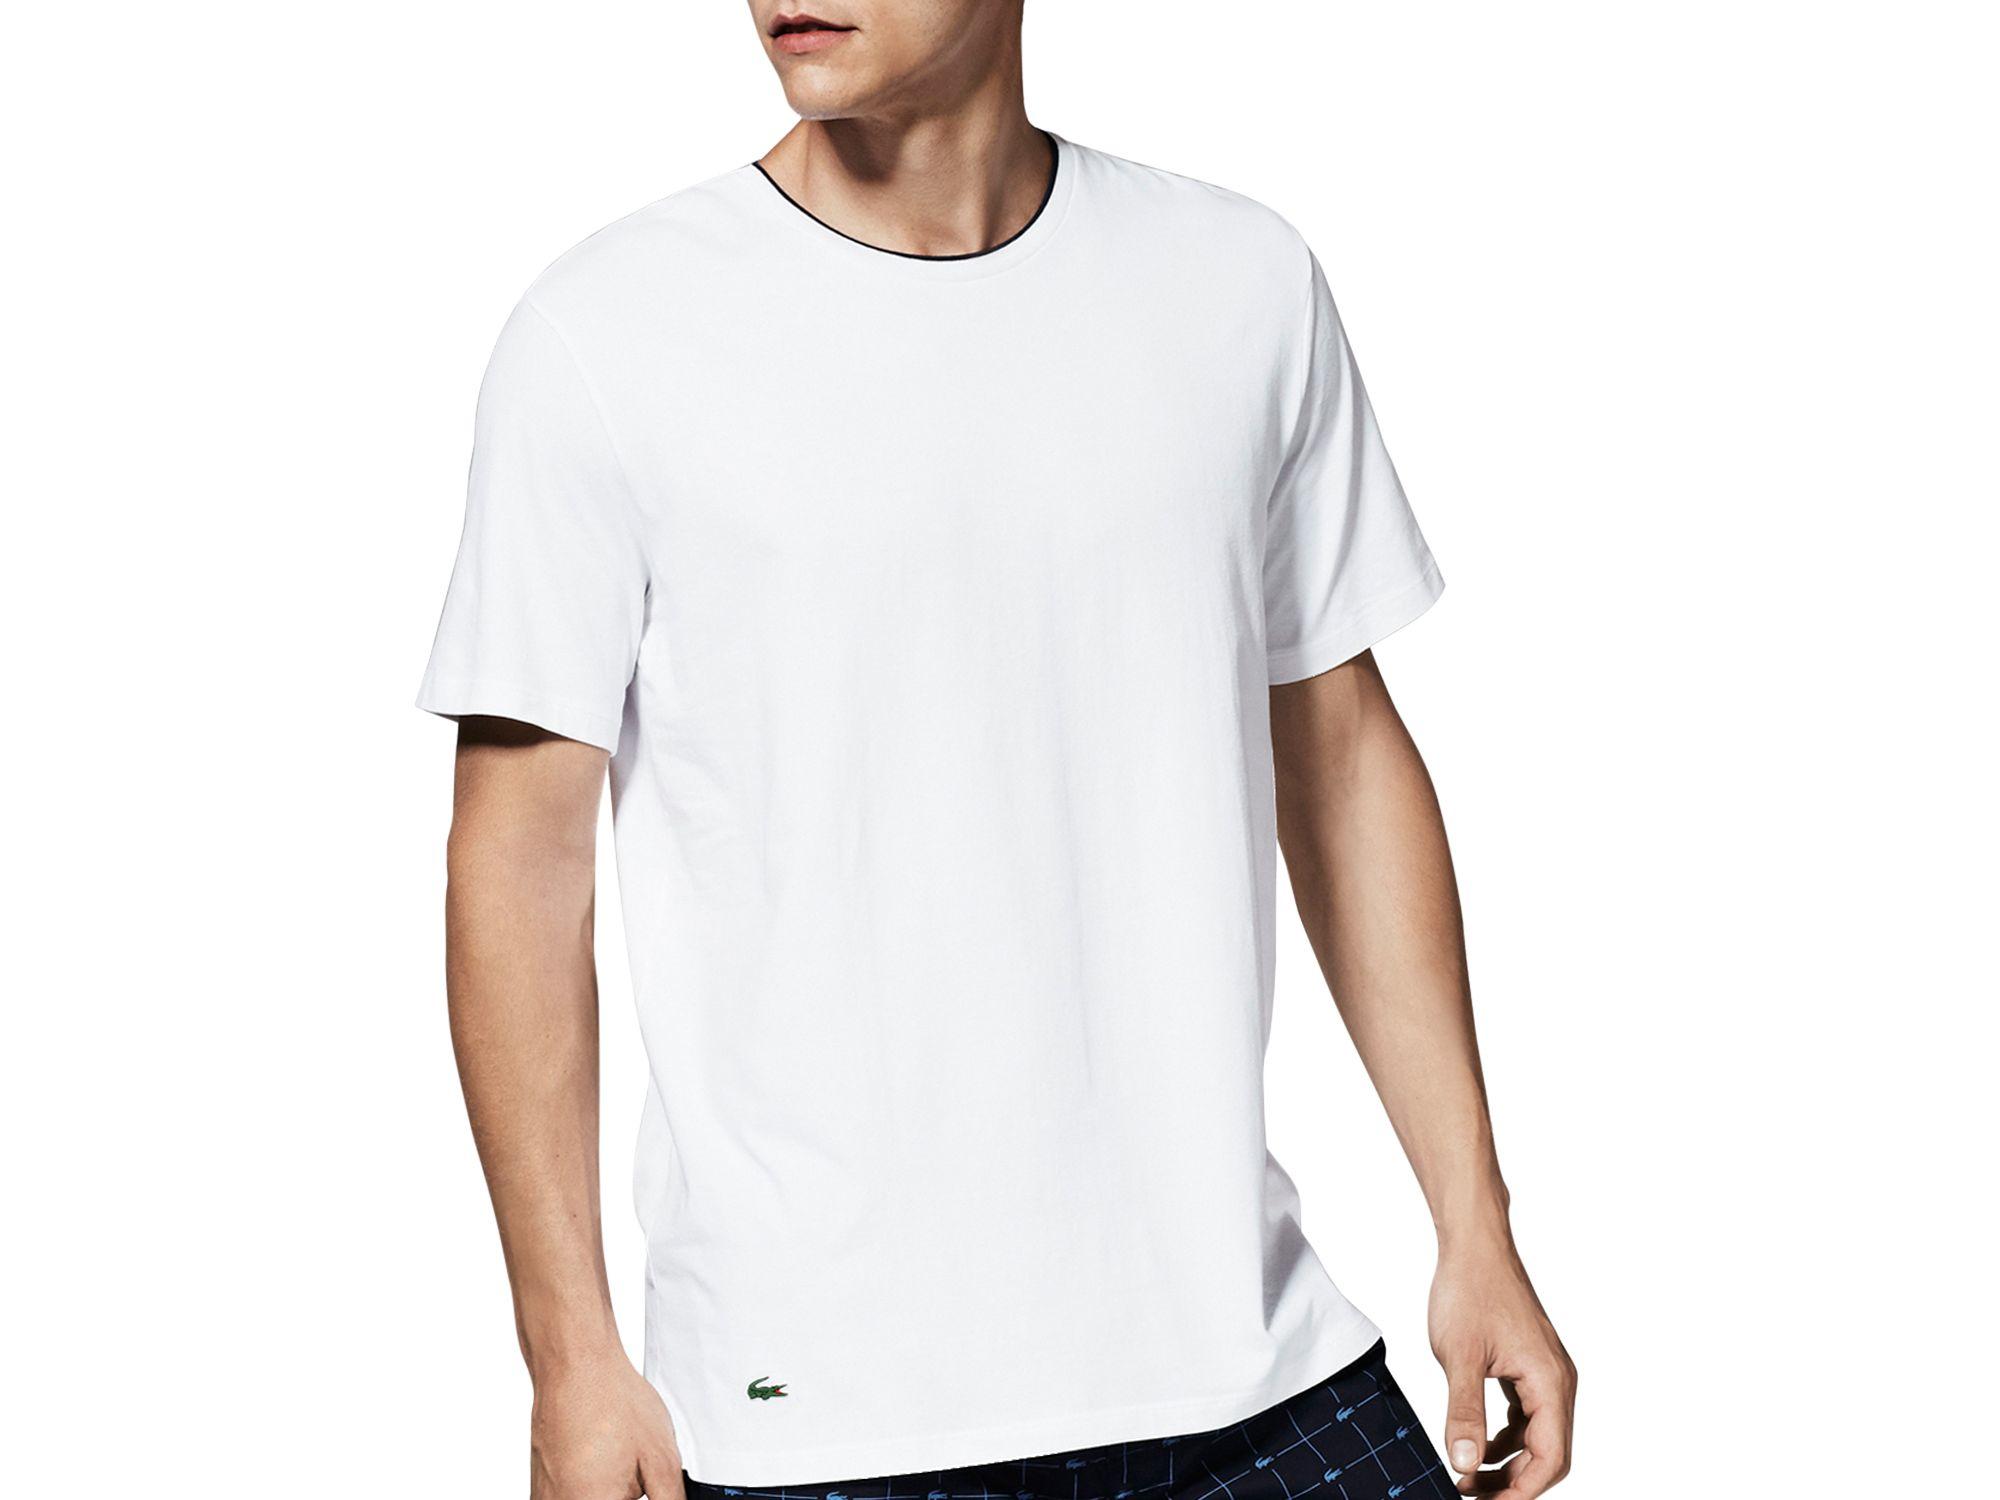 3453b9fd41 Lacoste Mens Cotton Stretch Crew Neck T Shirt   RLDM